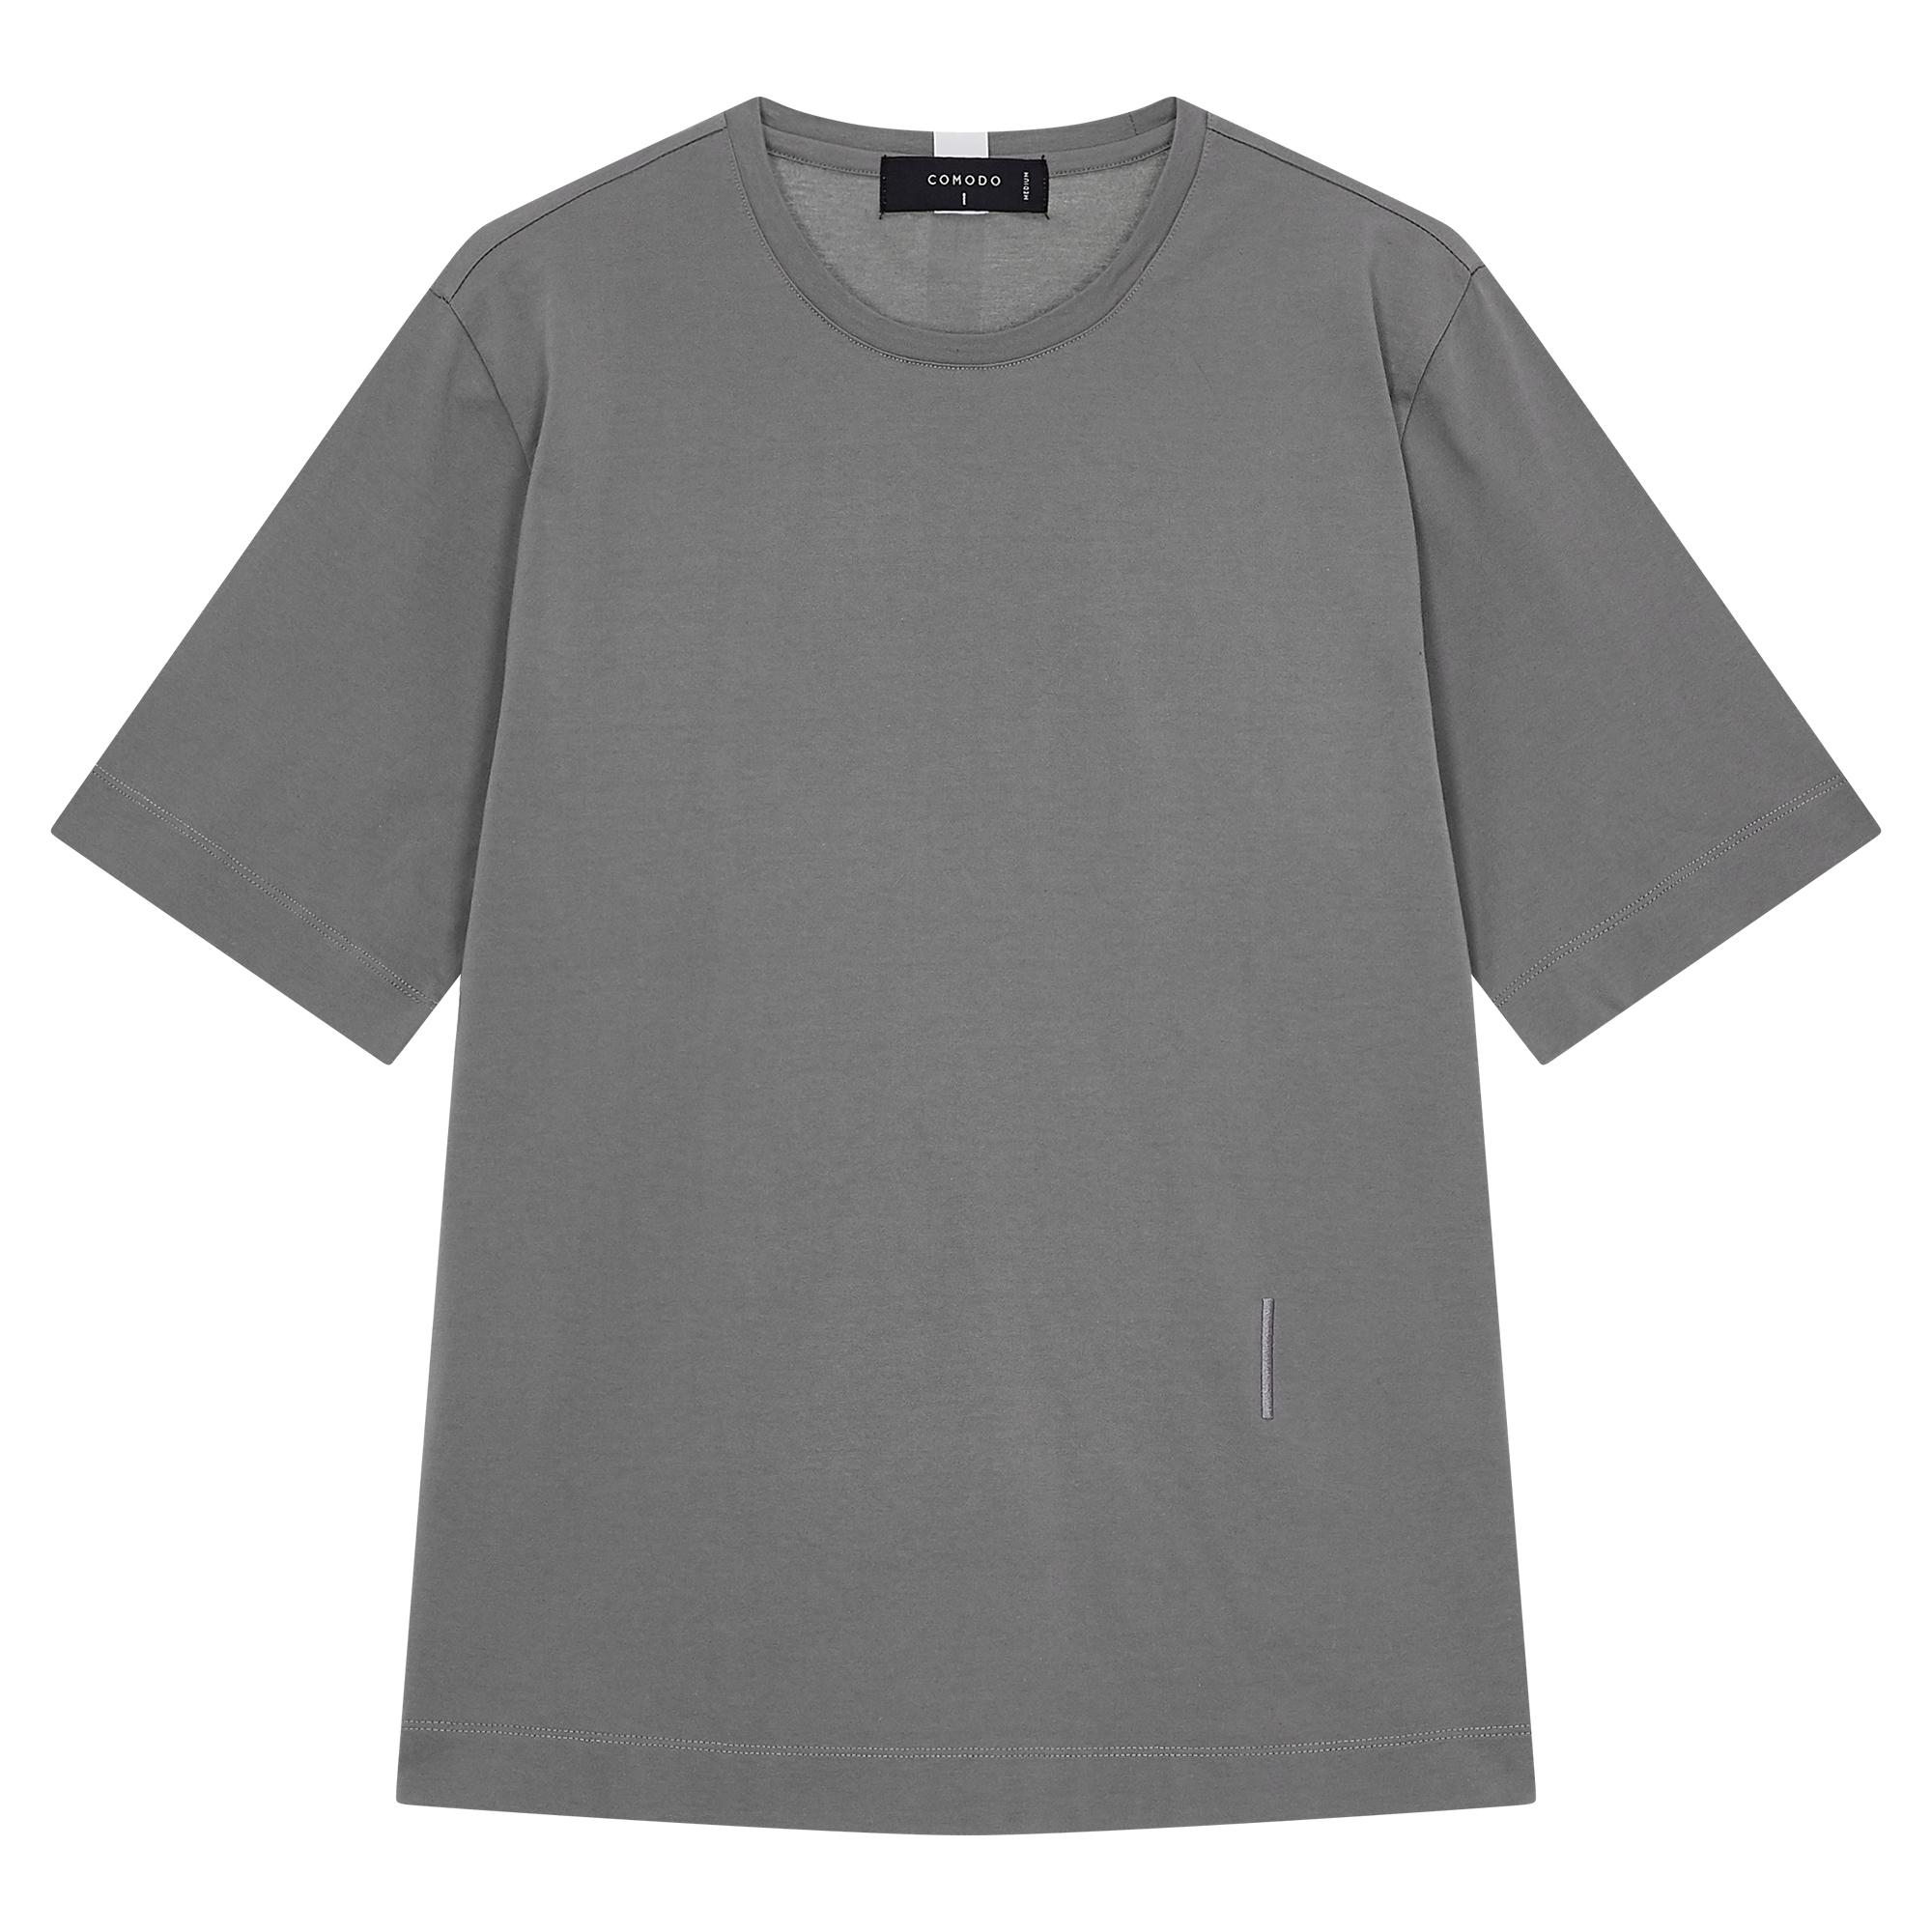 [ESSENTIAL] 모던 실켓 티셔츠